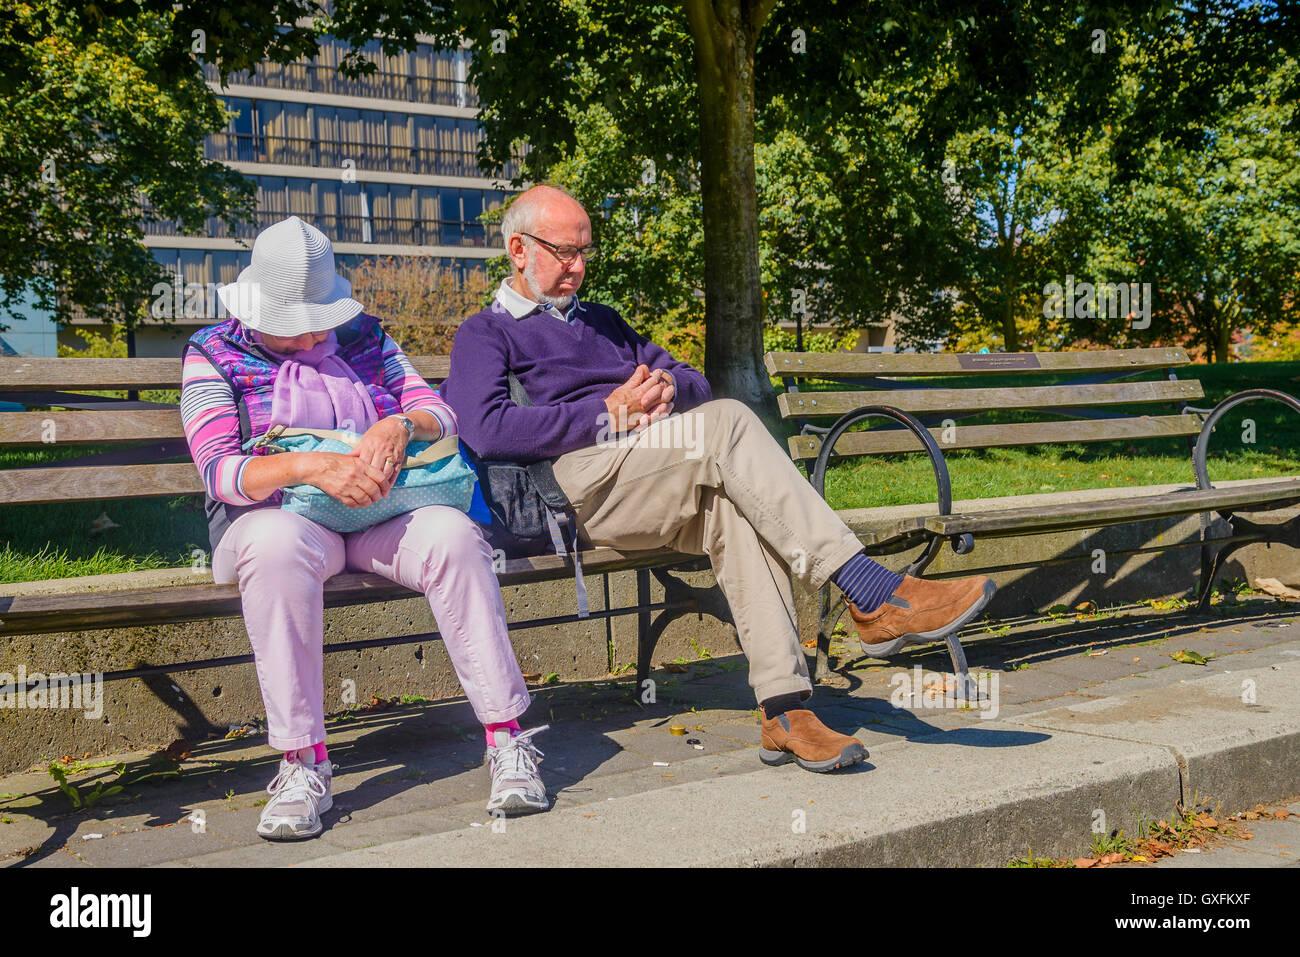 Elderly couple asleep on park bench - Stock Image